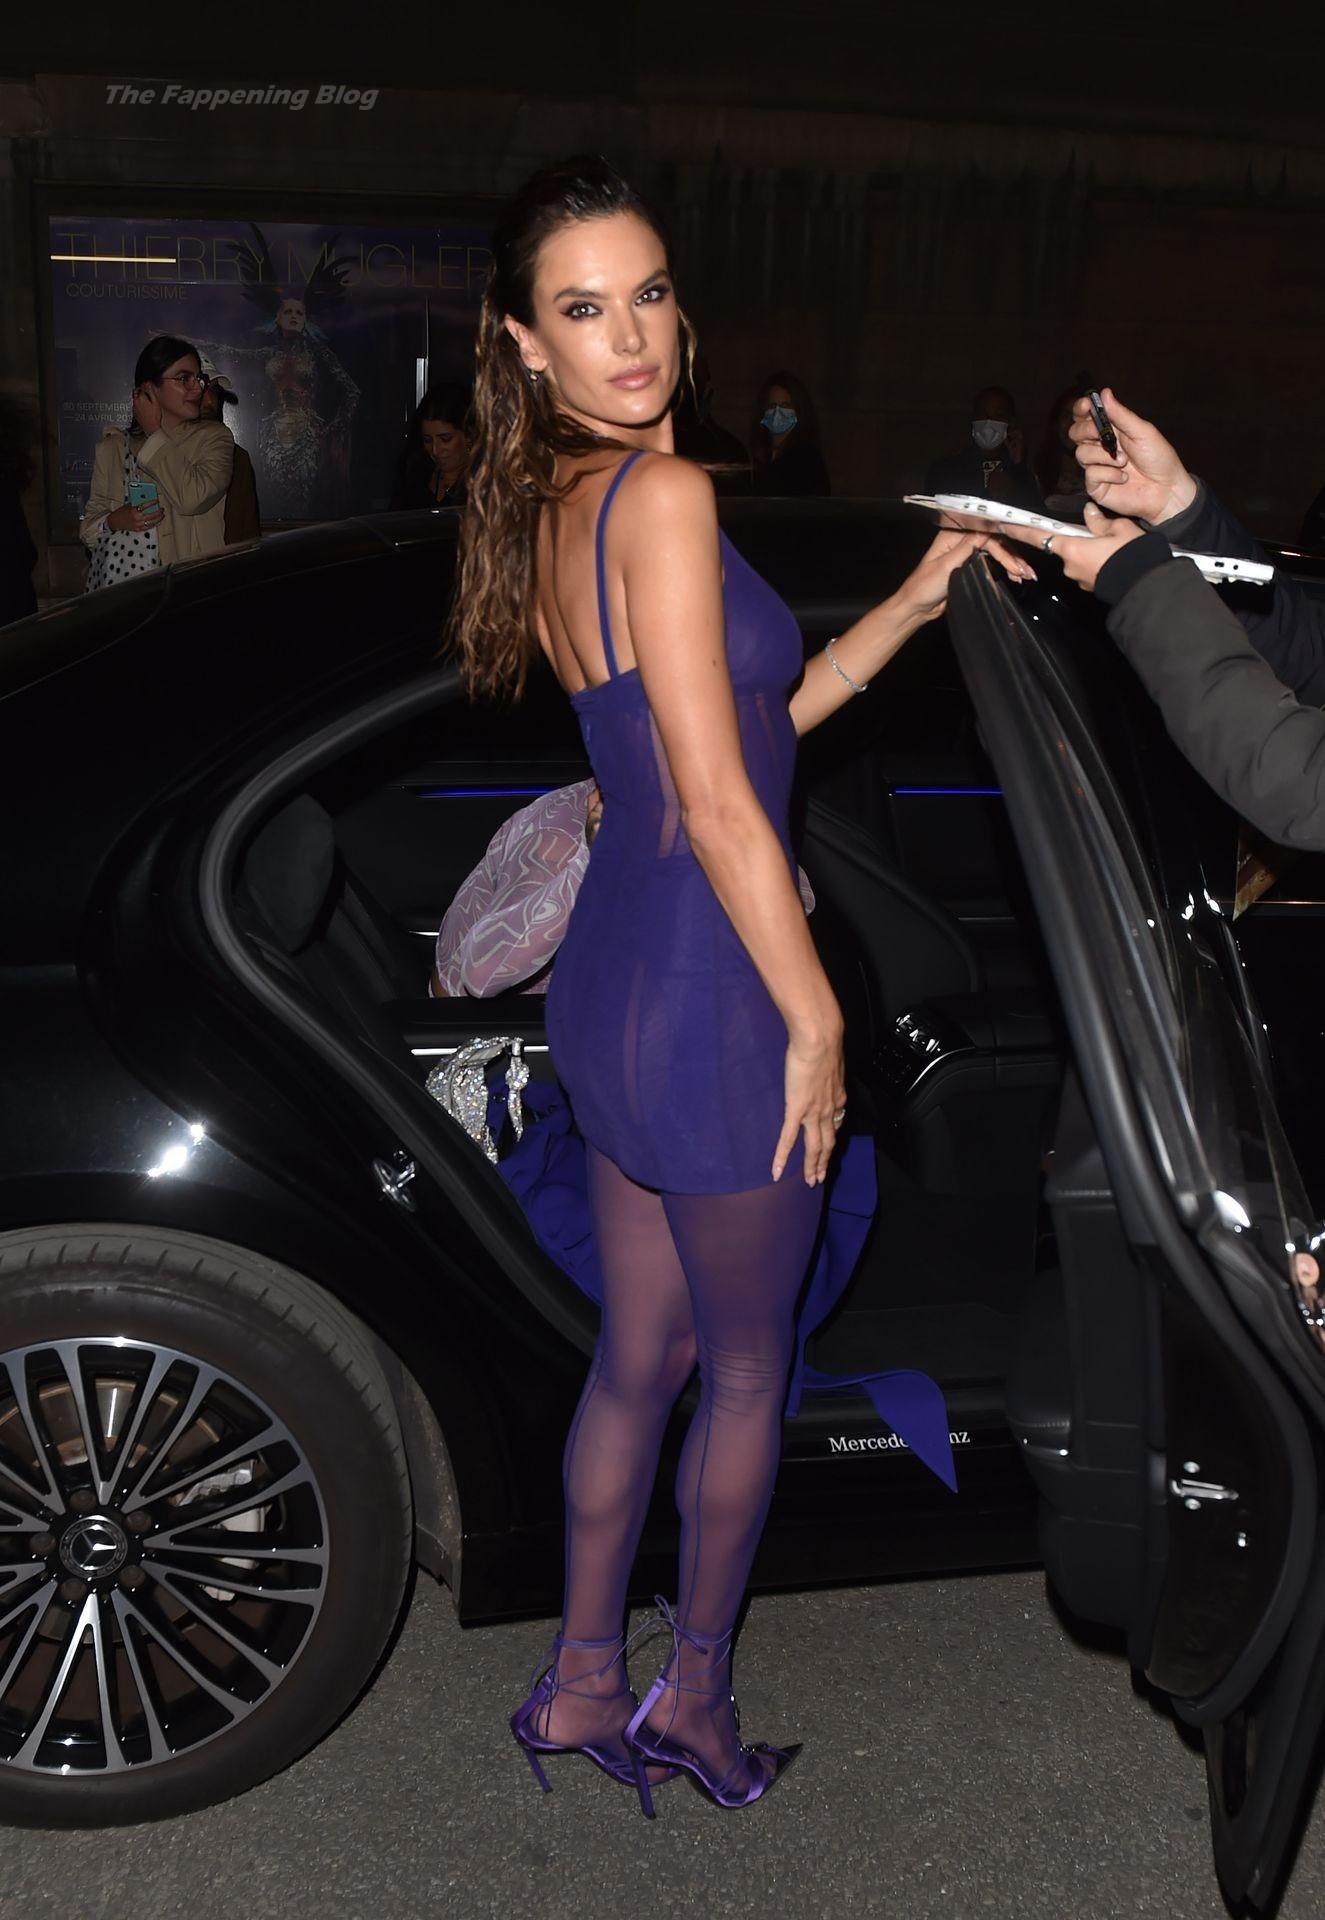 Alessandra-Ambrosio-Sexy-The-Fappening-Blog-89-1.jpg